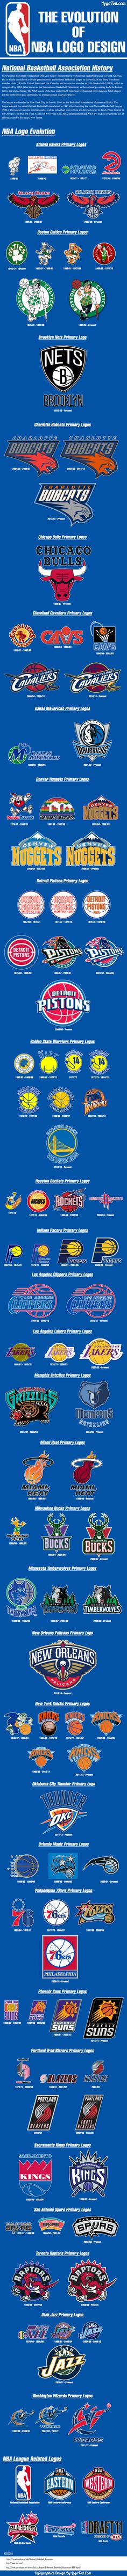 The Evolution of NBA Logo Design